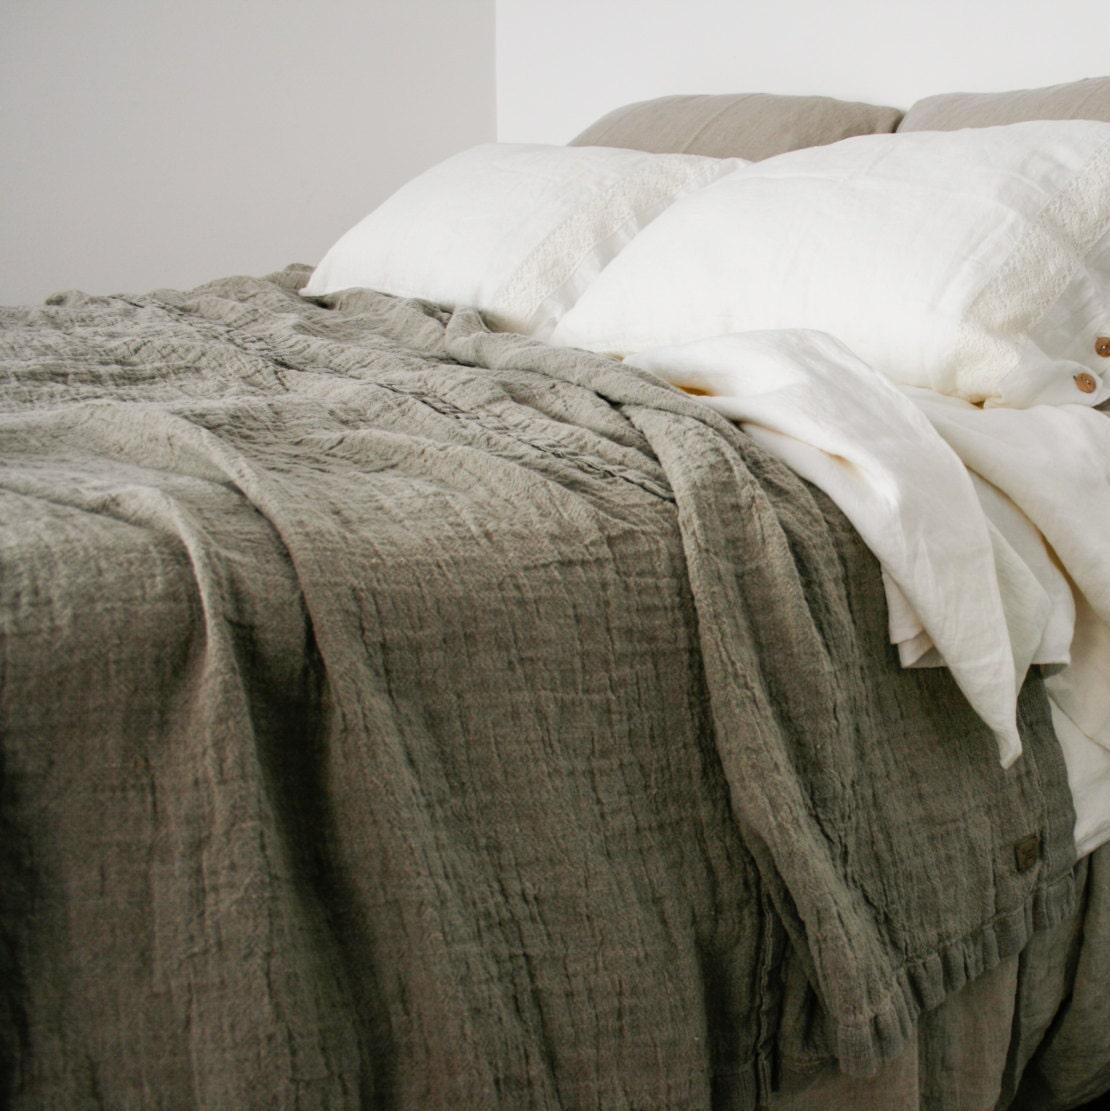 Linen Bedspread Rough Linen Rustic Style Bed Cover Queen